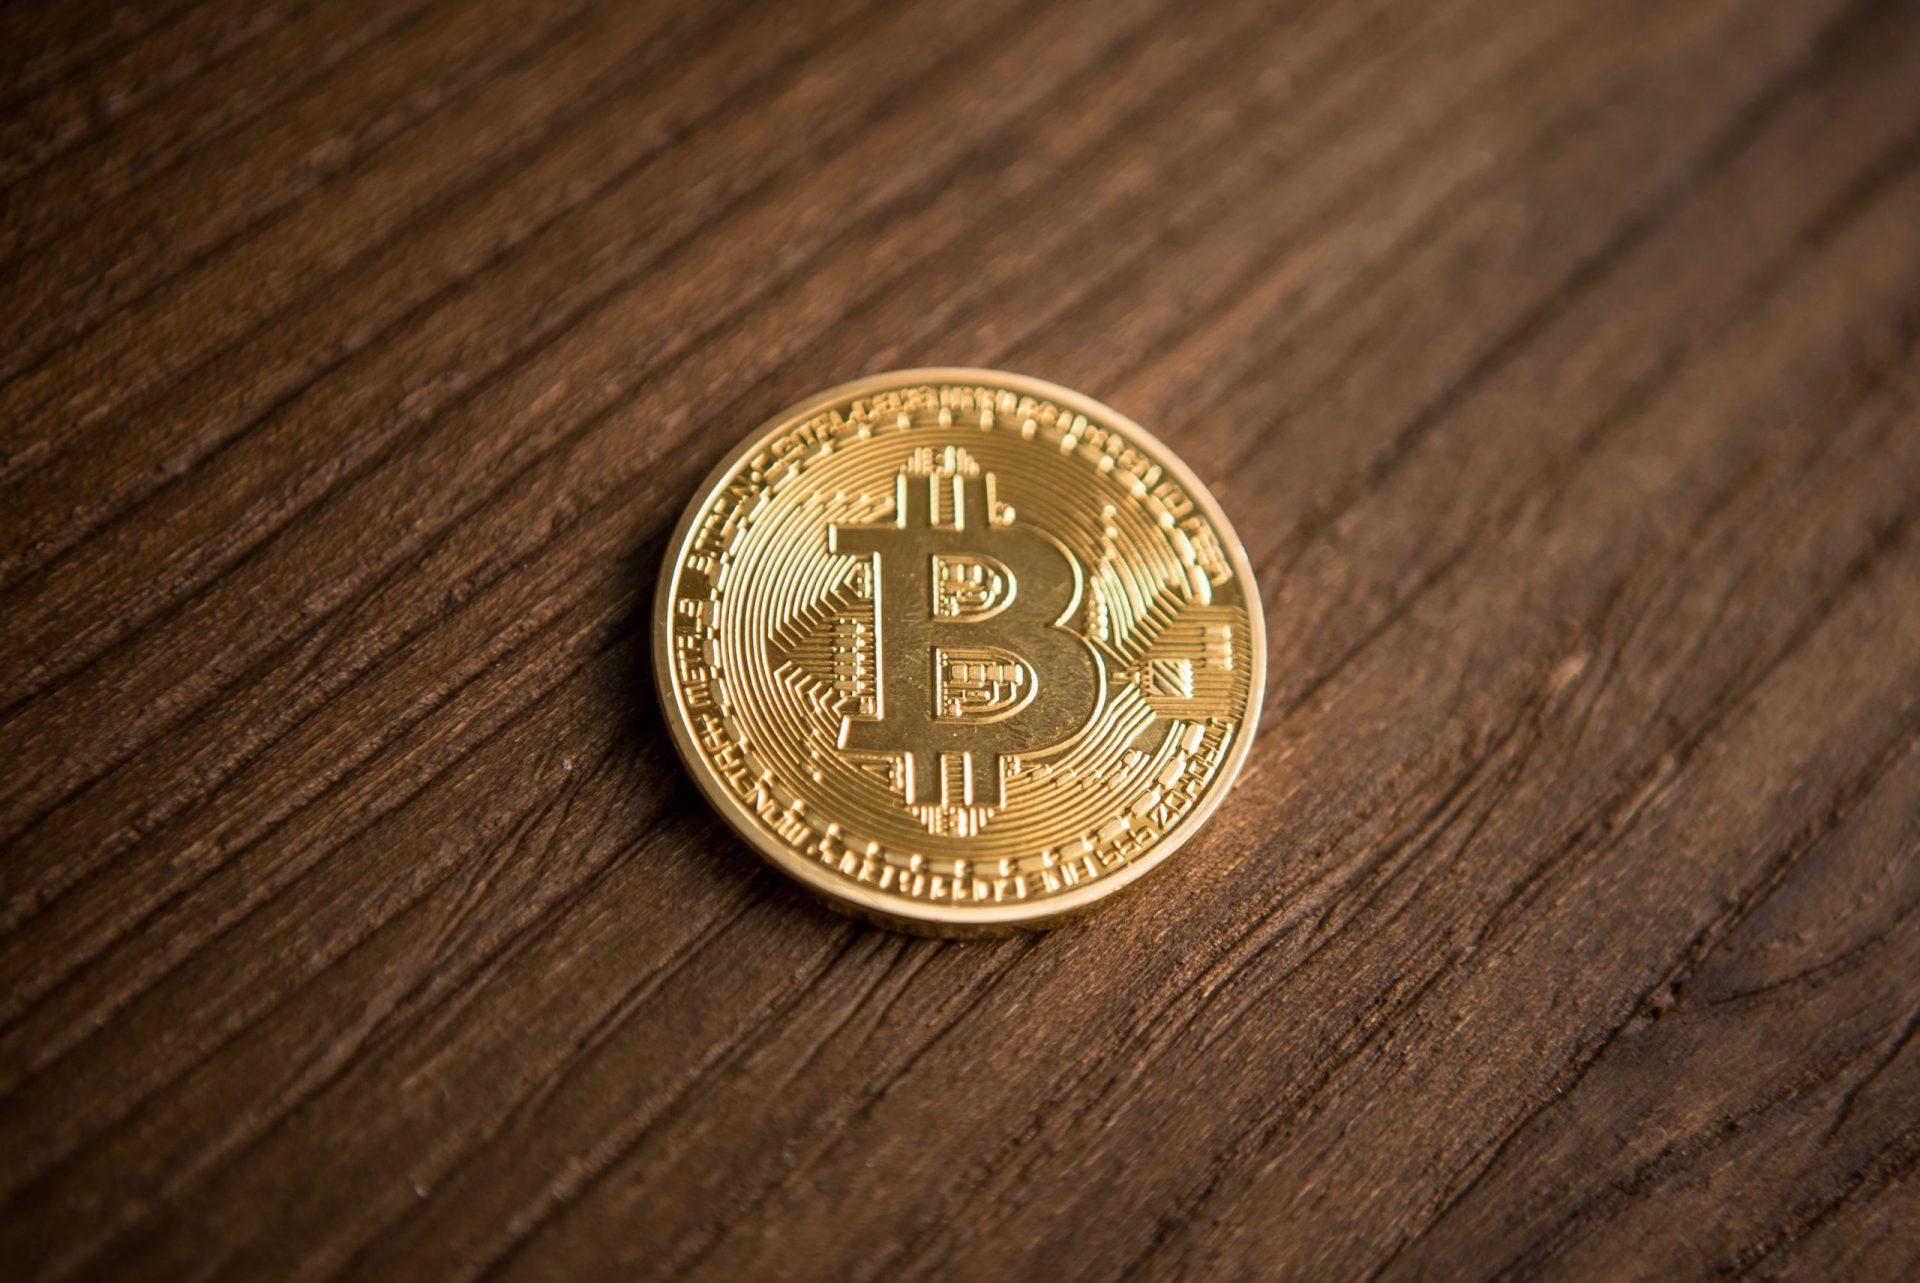 Analyst Eyes 25% Bitcoin (BTC) Drop to $8,800 After Bearish Breakdown 14